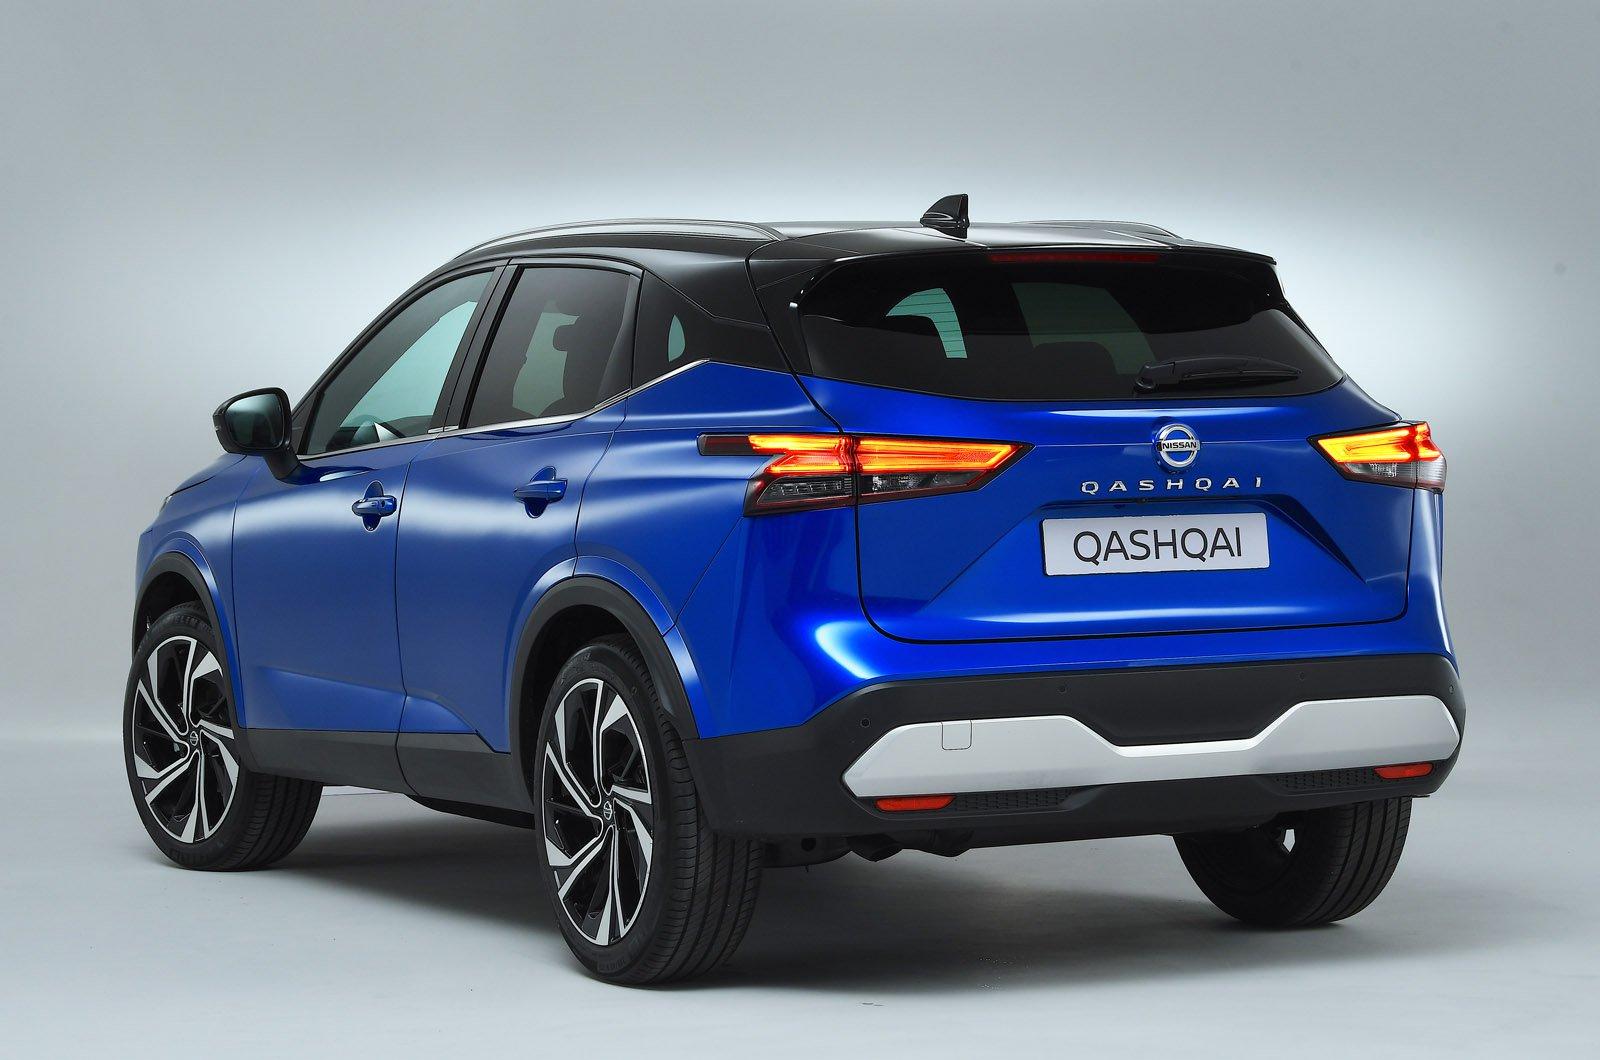 Nissan Qashqai 2021 rear studio